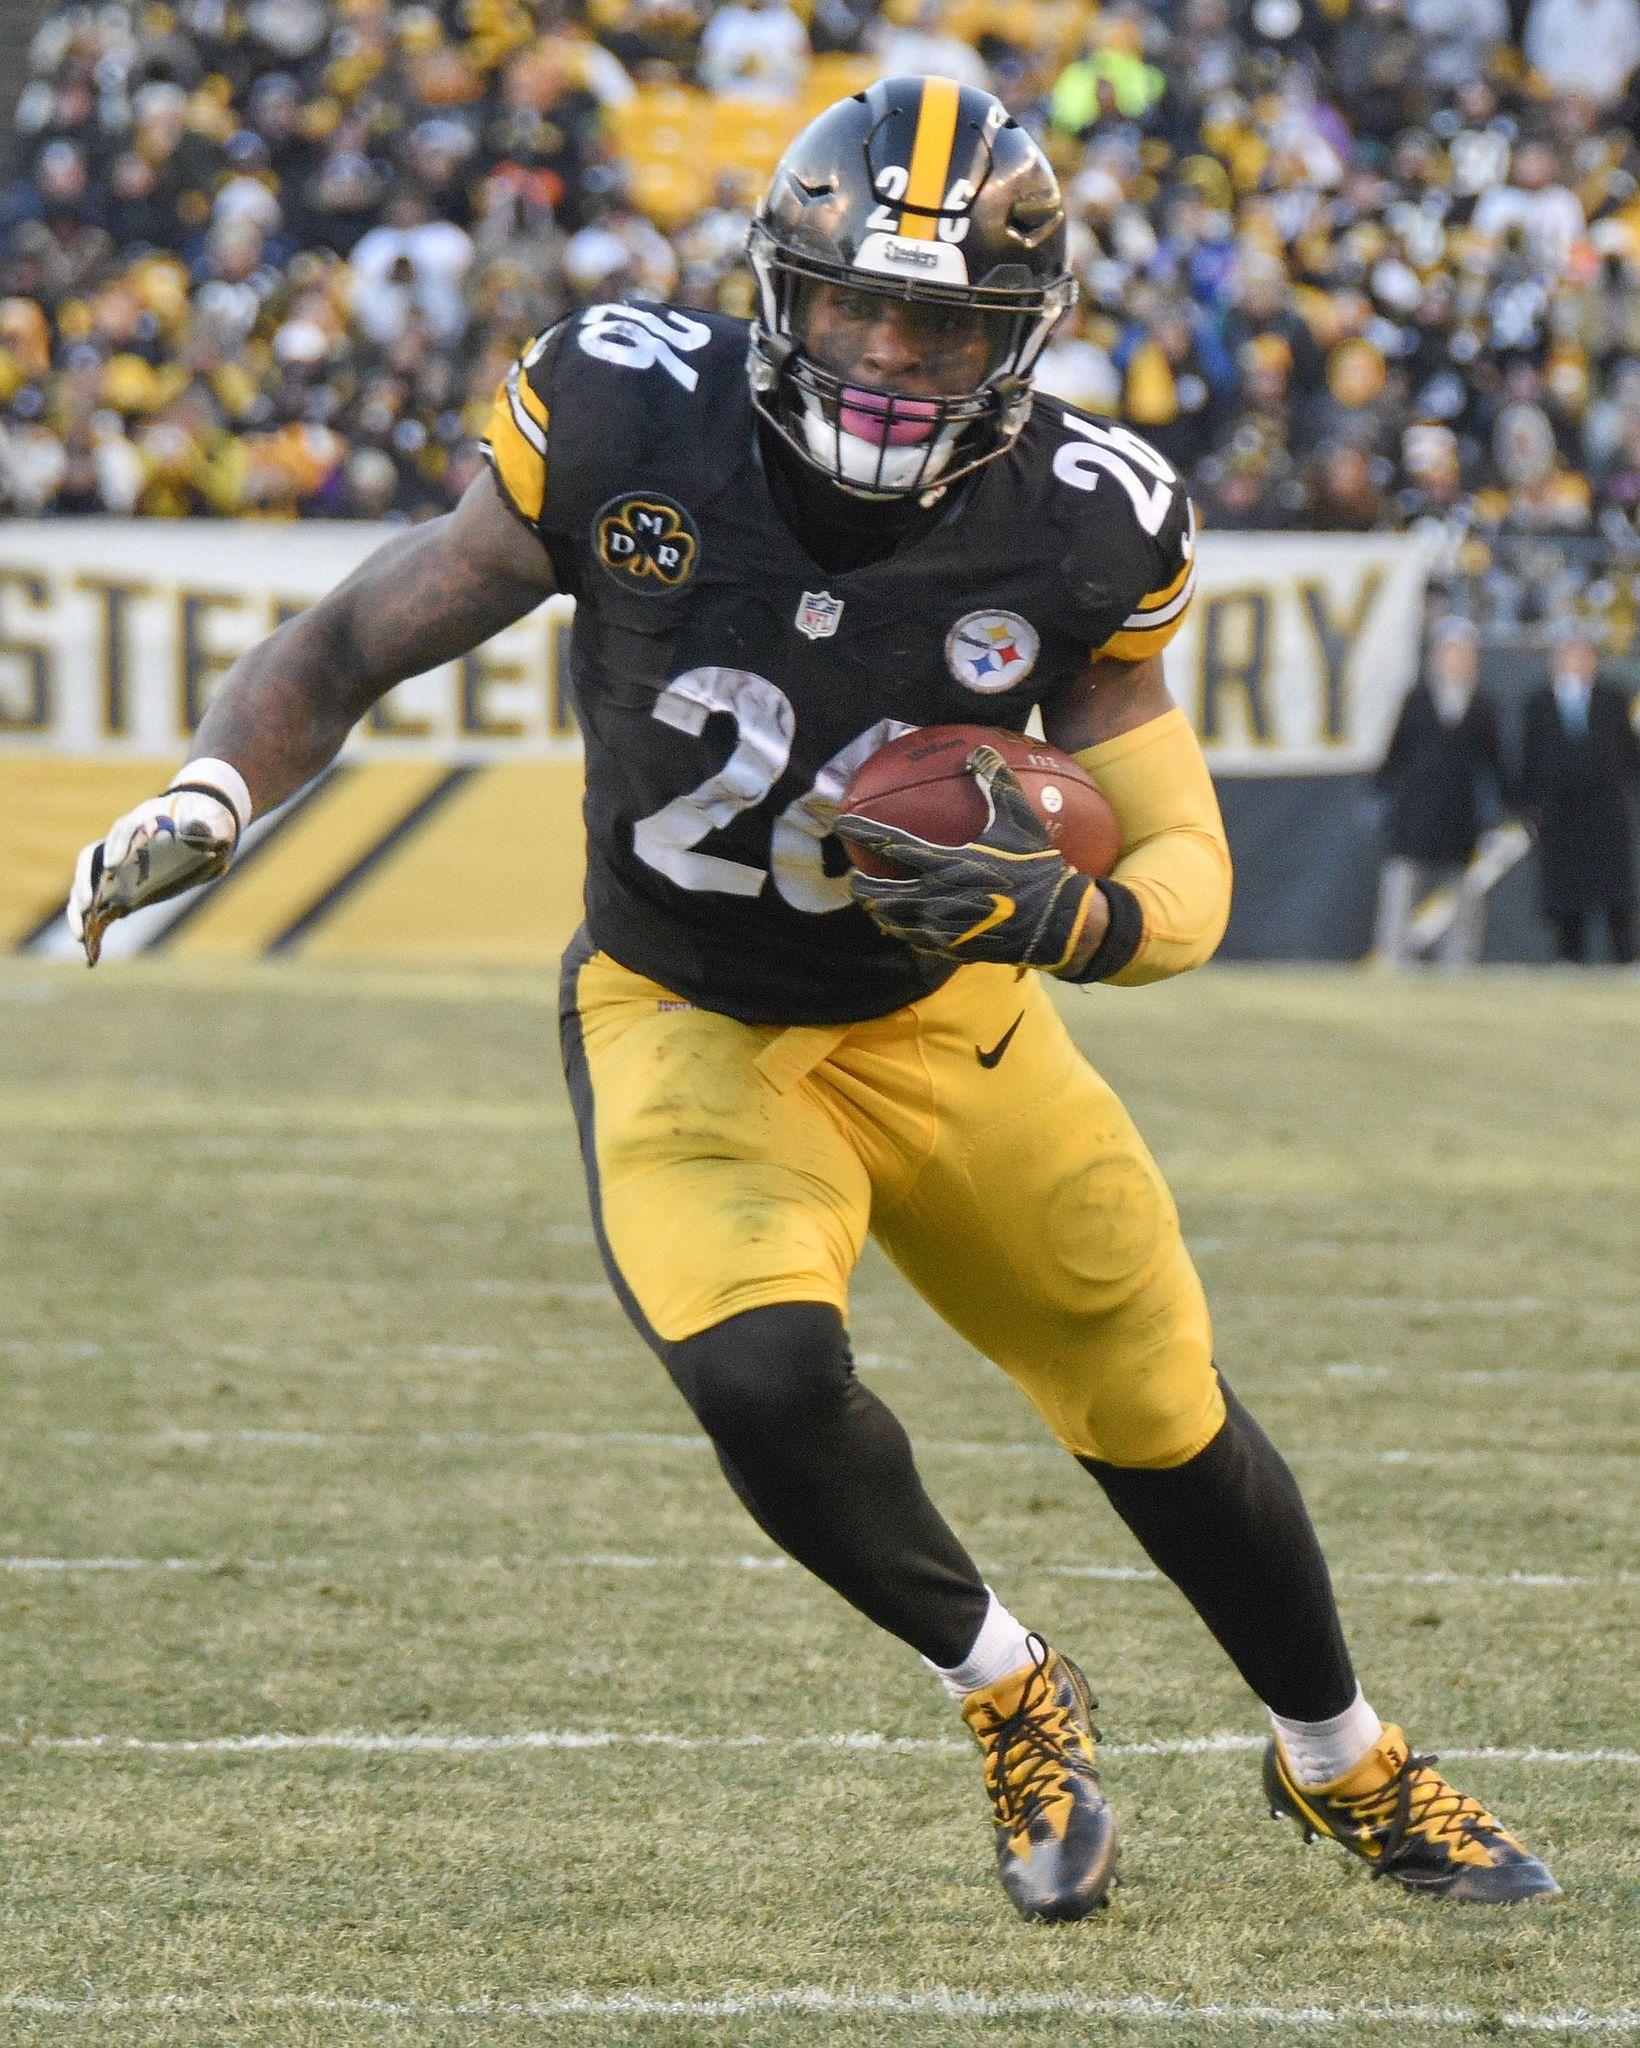 Steelers_bell_football_36672_s1640x2048